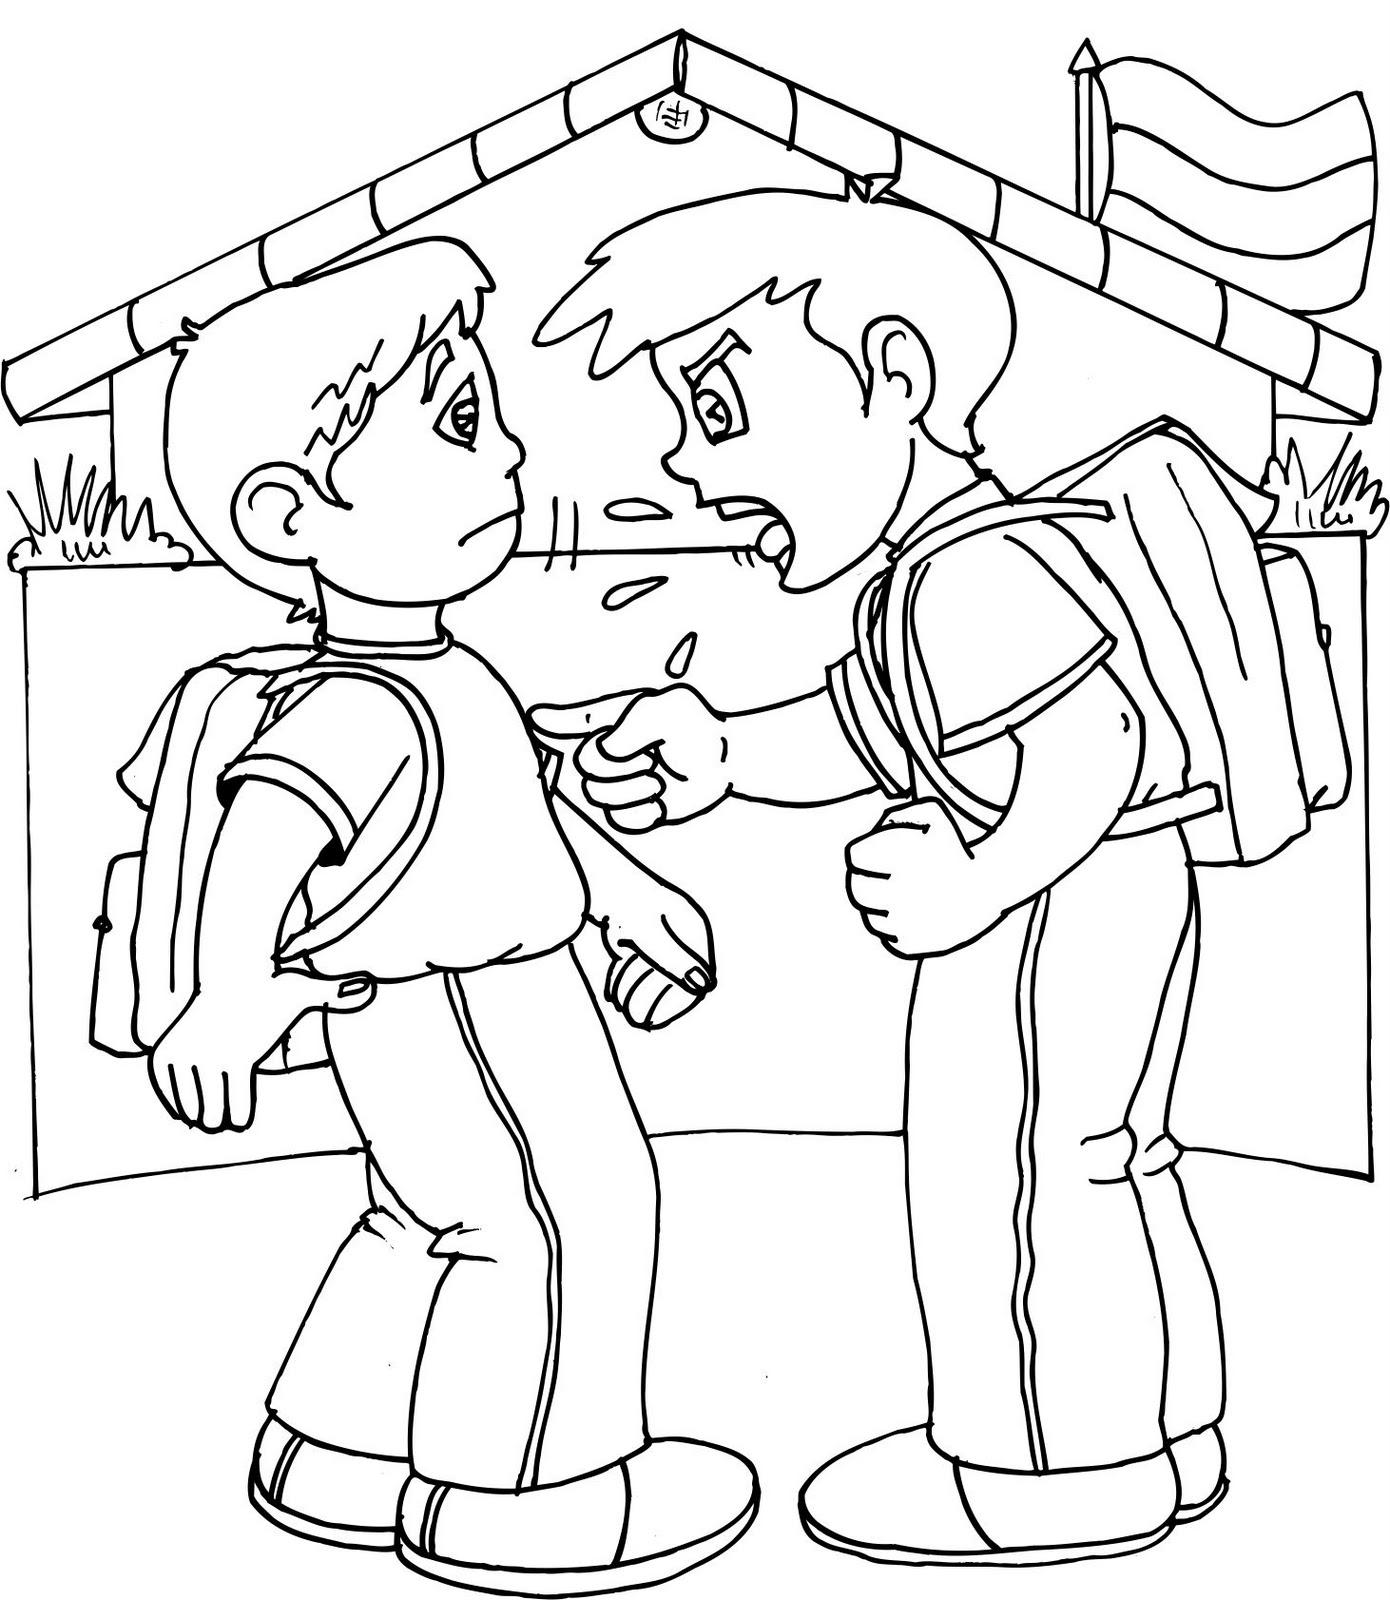 Dibujos De Acoso Escolar Para Colorear Dibujo De Zona Libre De Acoso